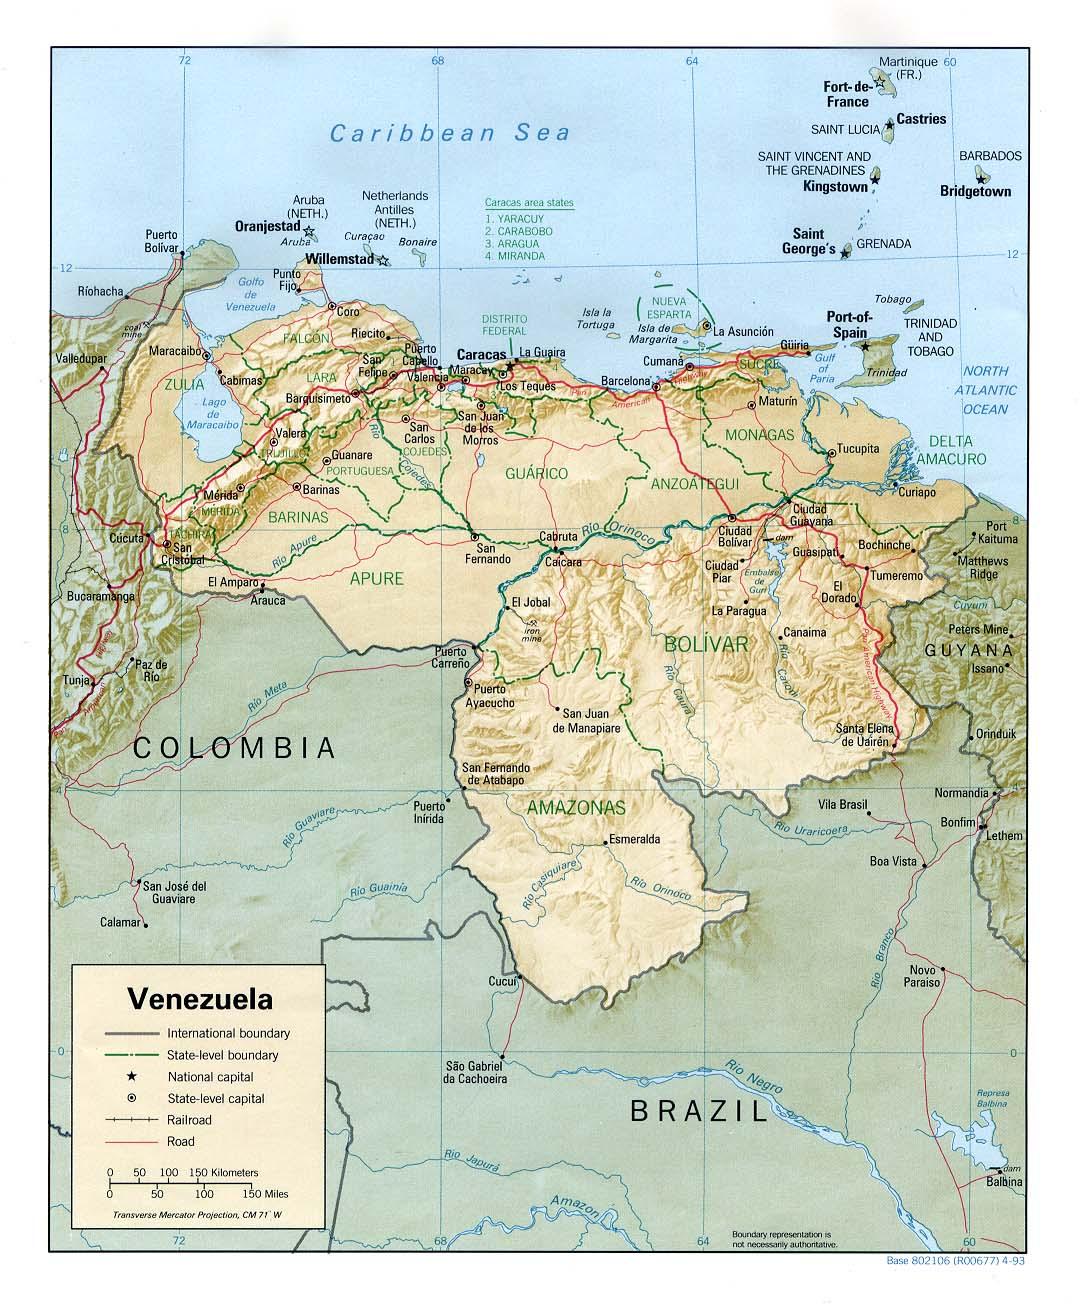 #Venezuela - harta gjeografike e Venezuelës